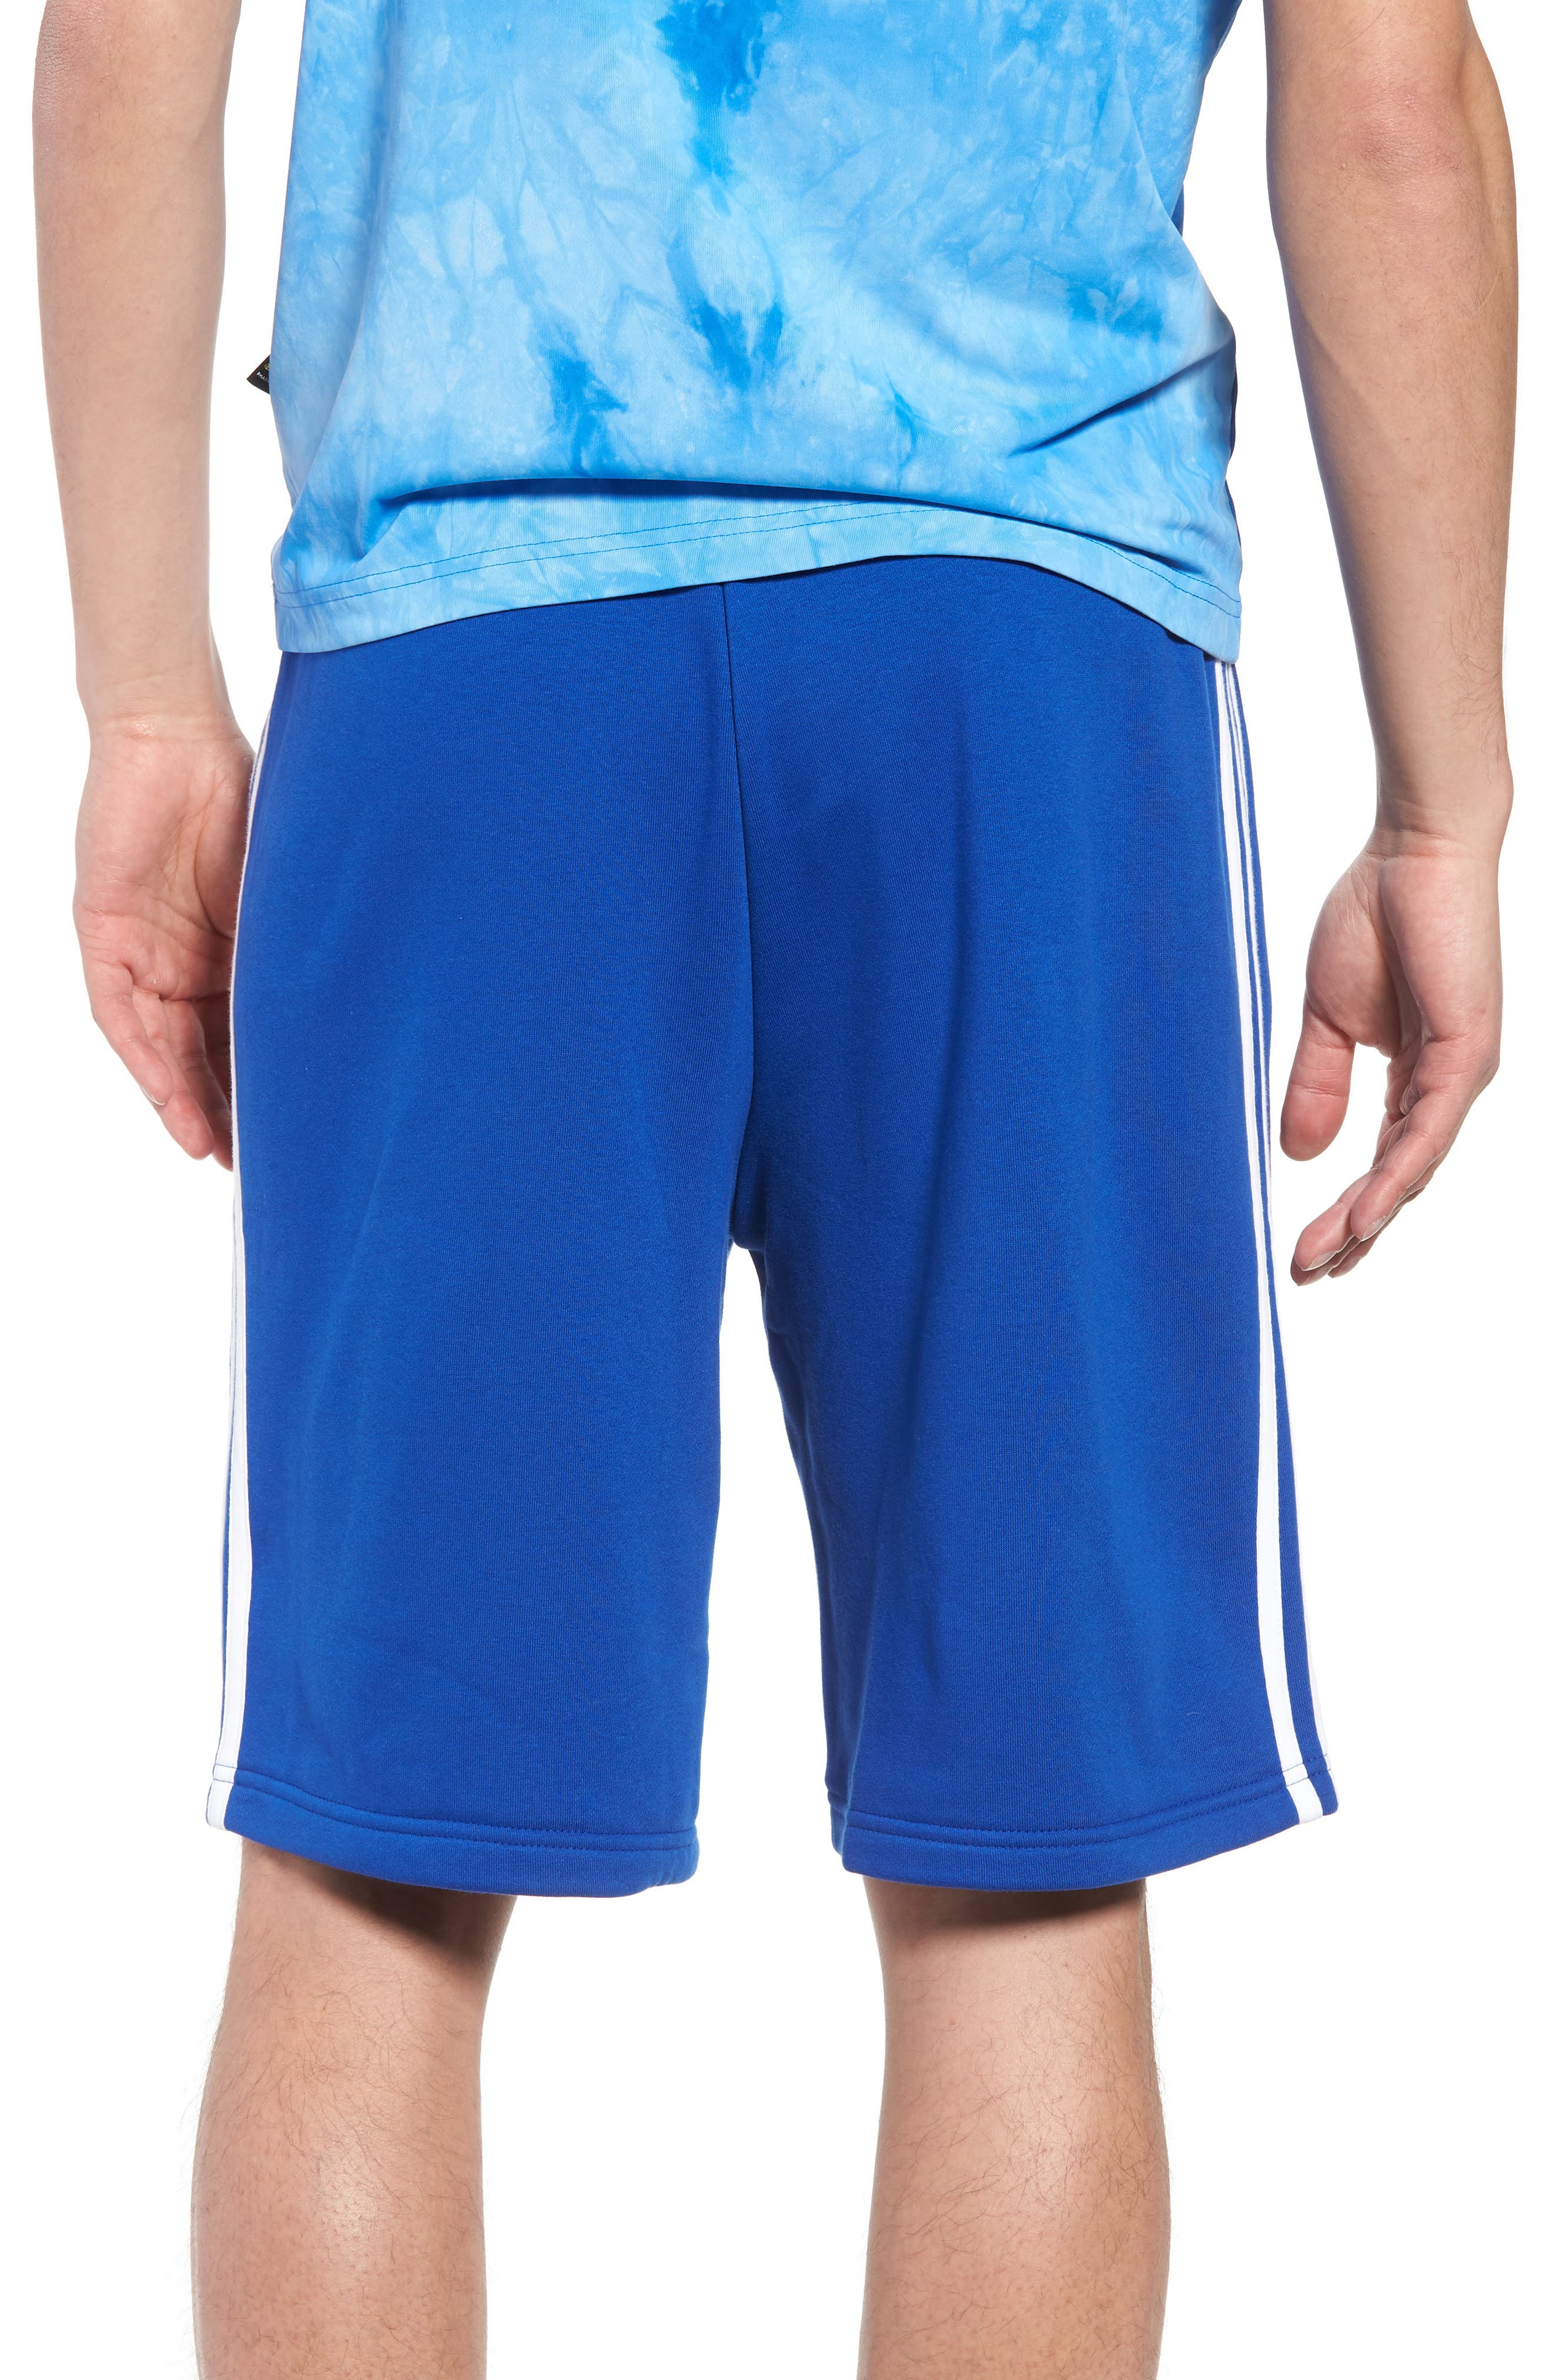 Alternate Image 2  - adidas Originals 3-Stripes Shorts